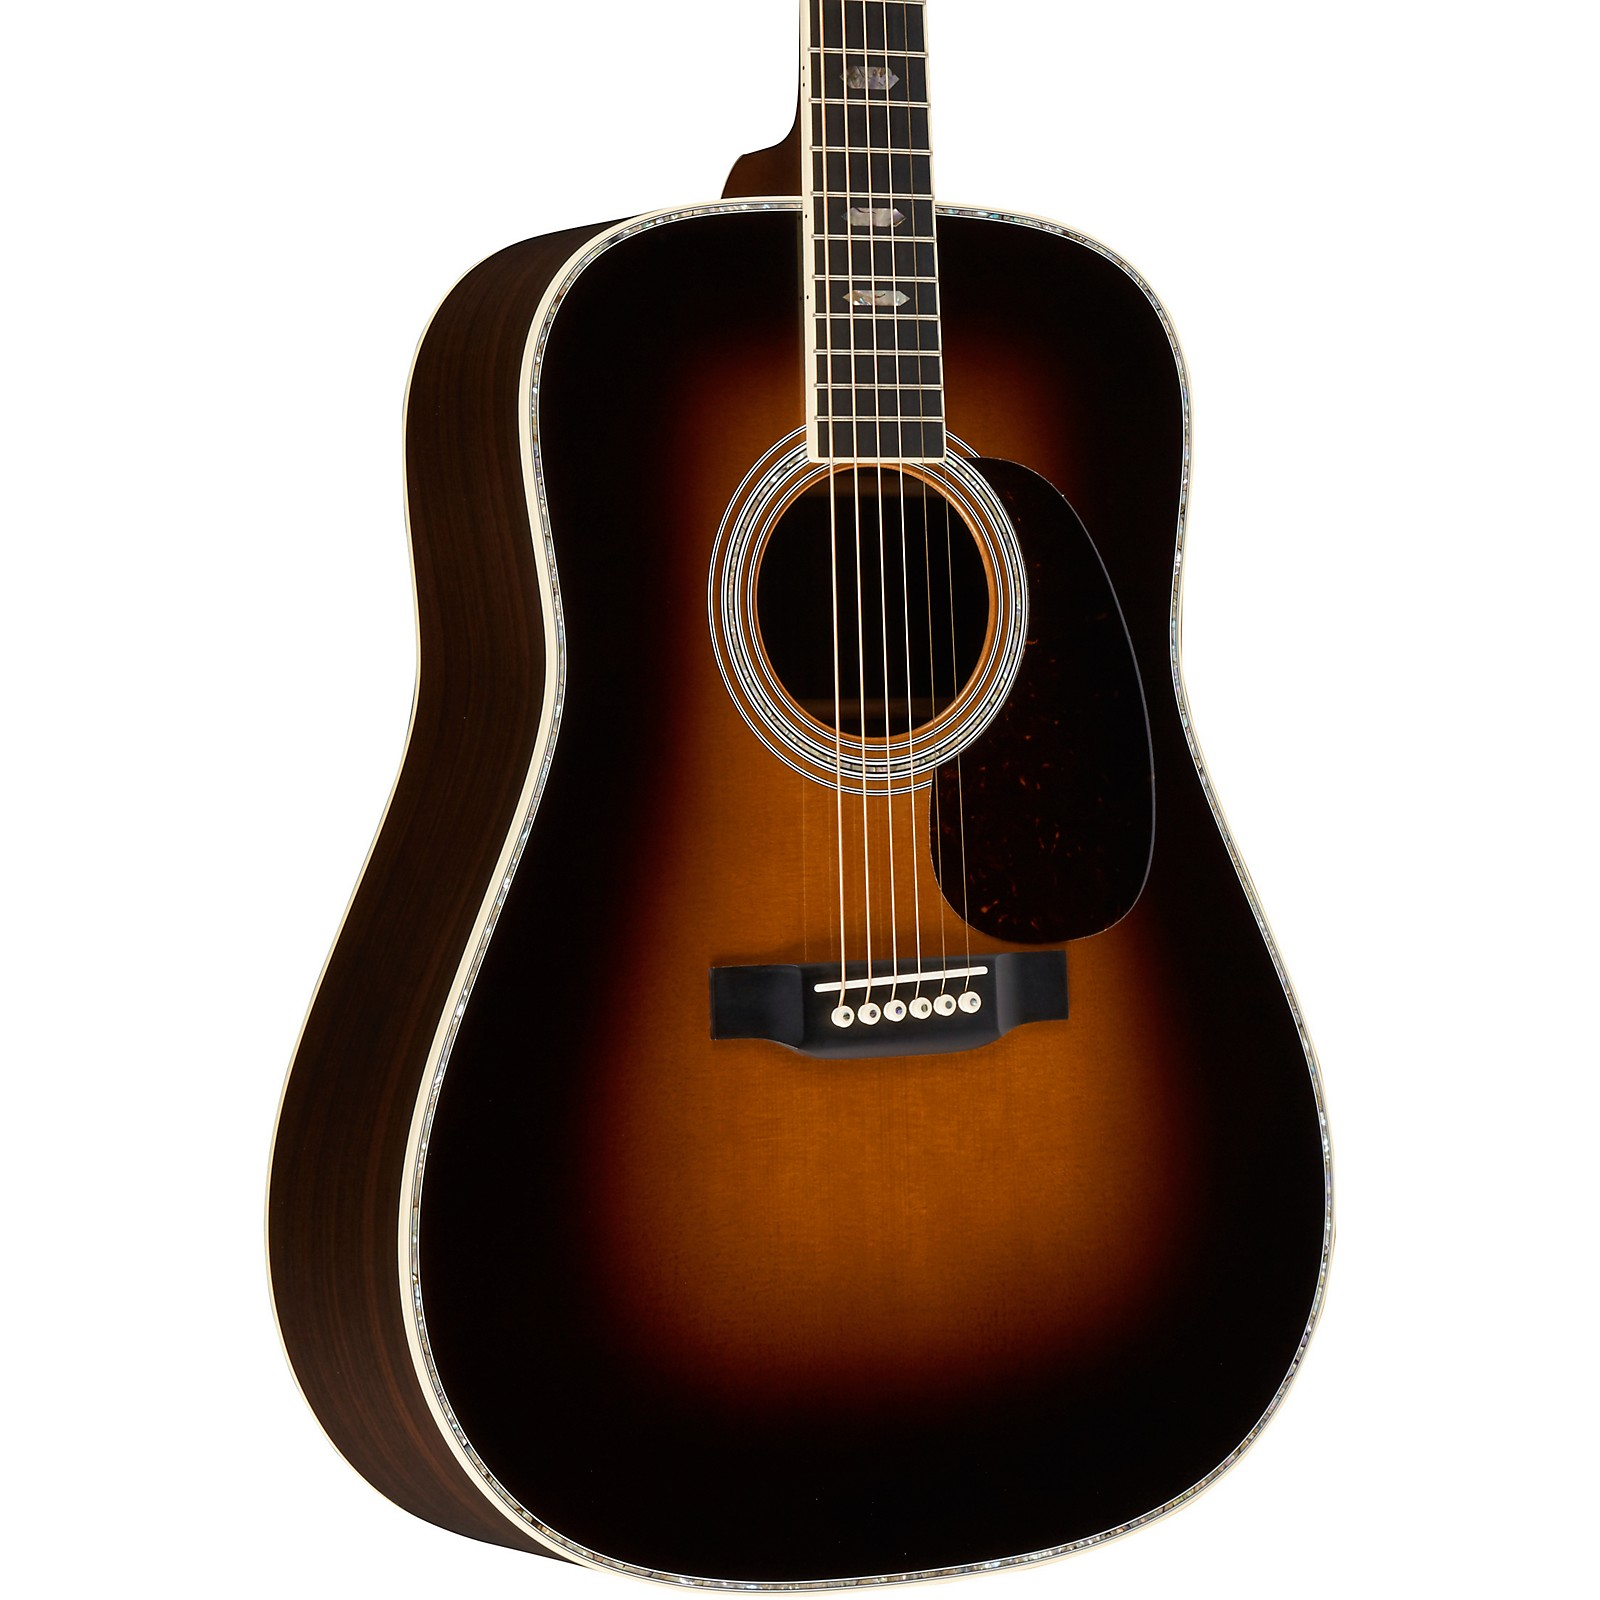 Martin D-41 Standard Dreadnought Acoustic Guitar